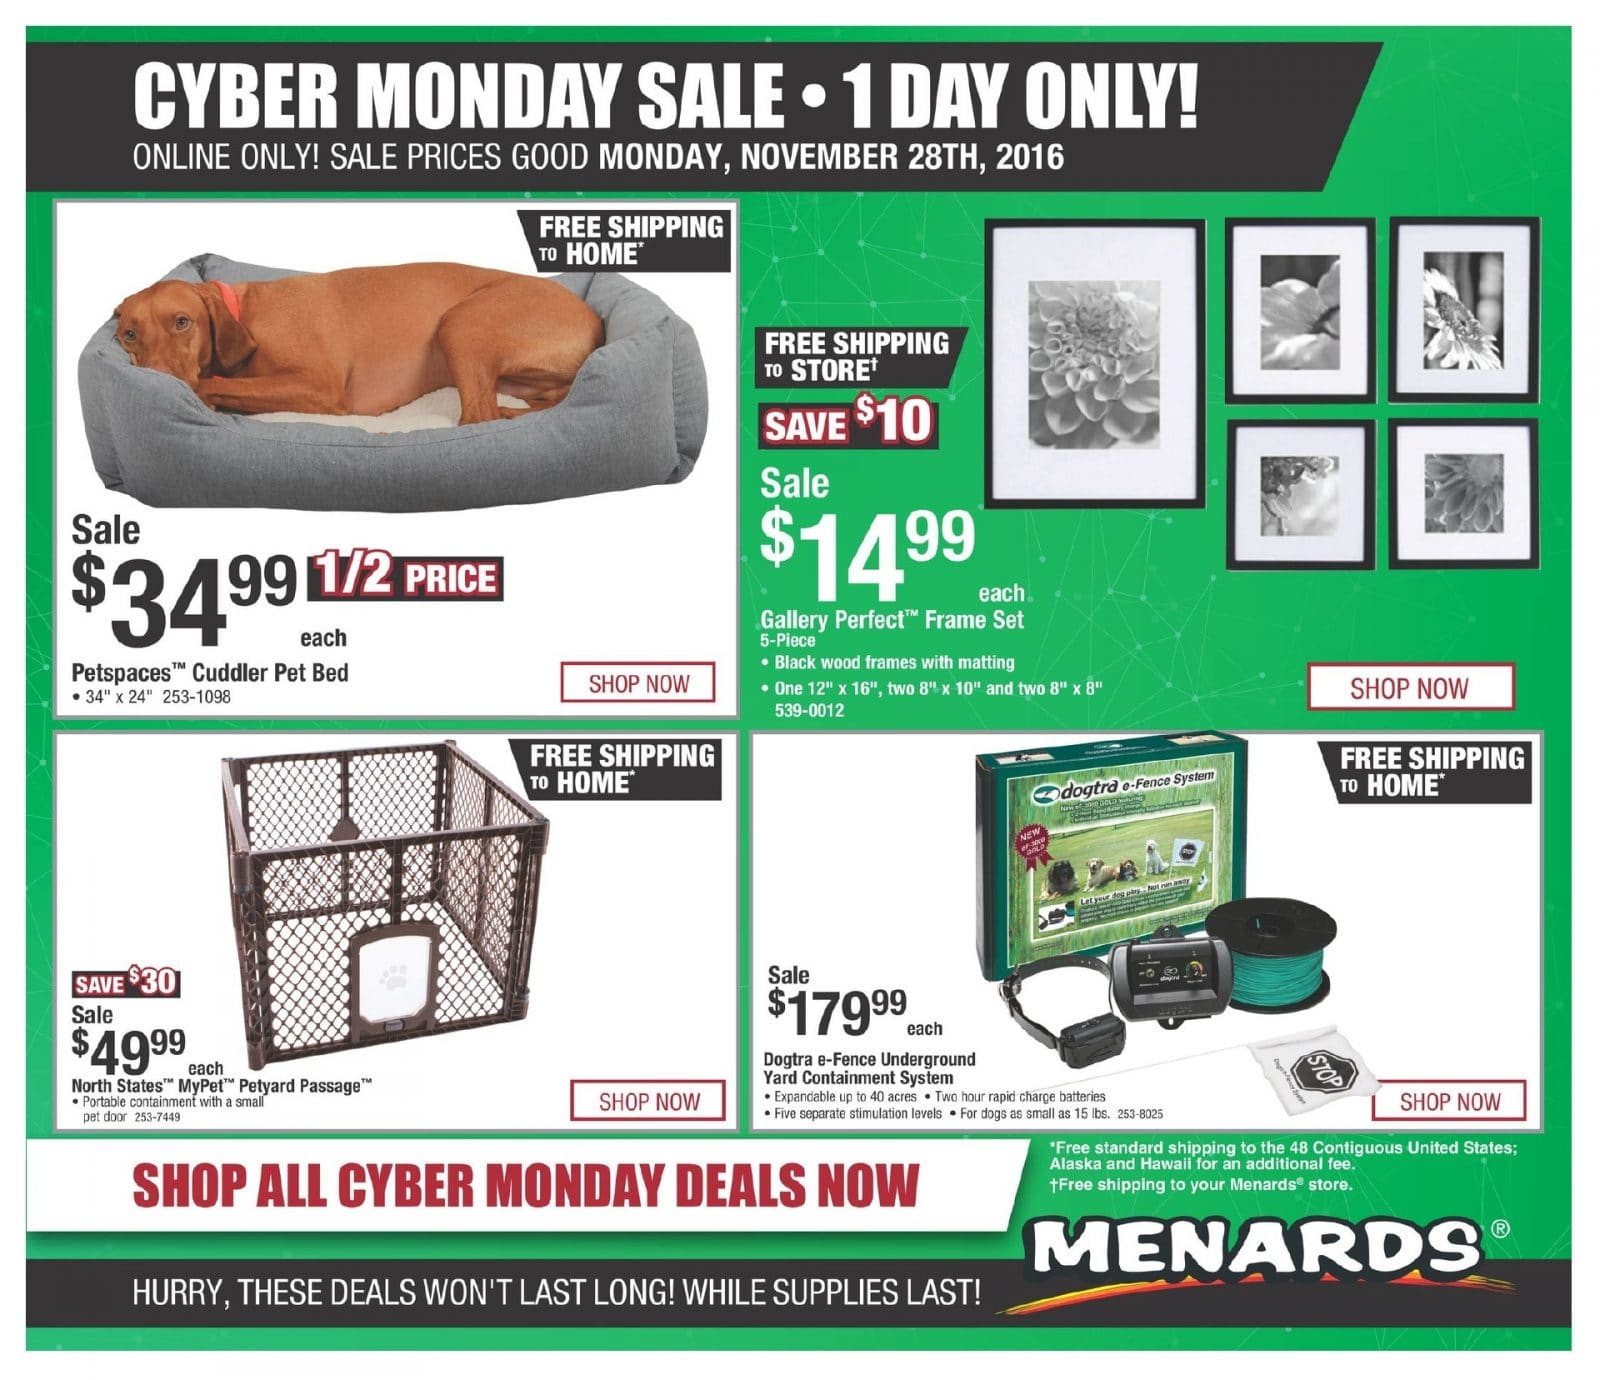 Menards Cyber Monday 2016 Ad